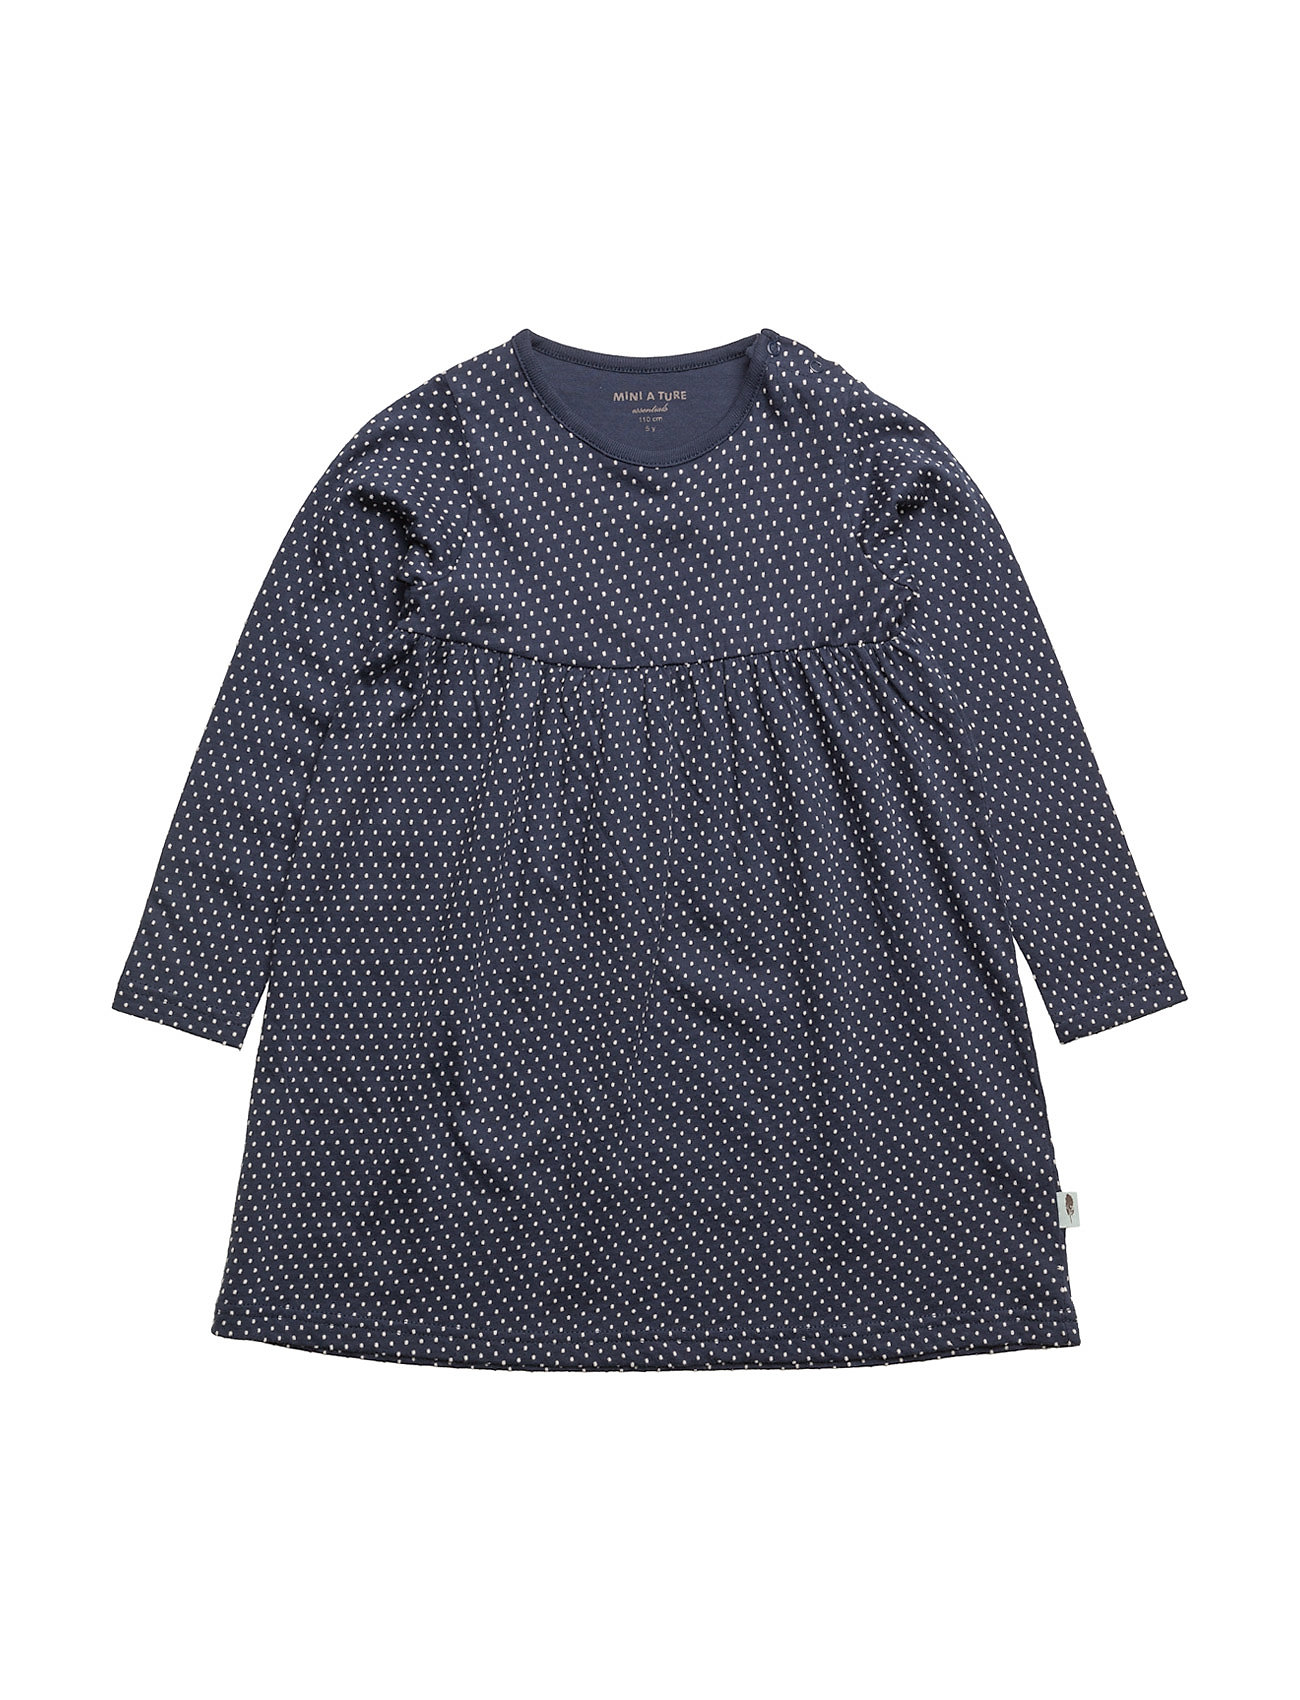 Else Dress, Bm Mini A Ture Kjoler til Børn i